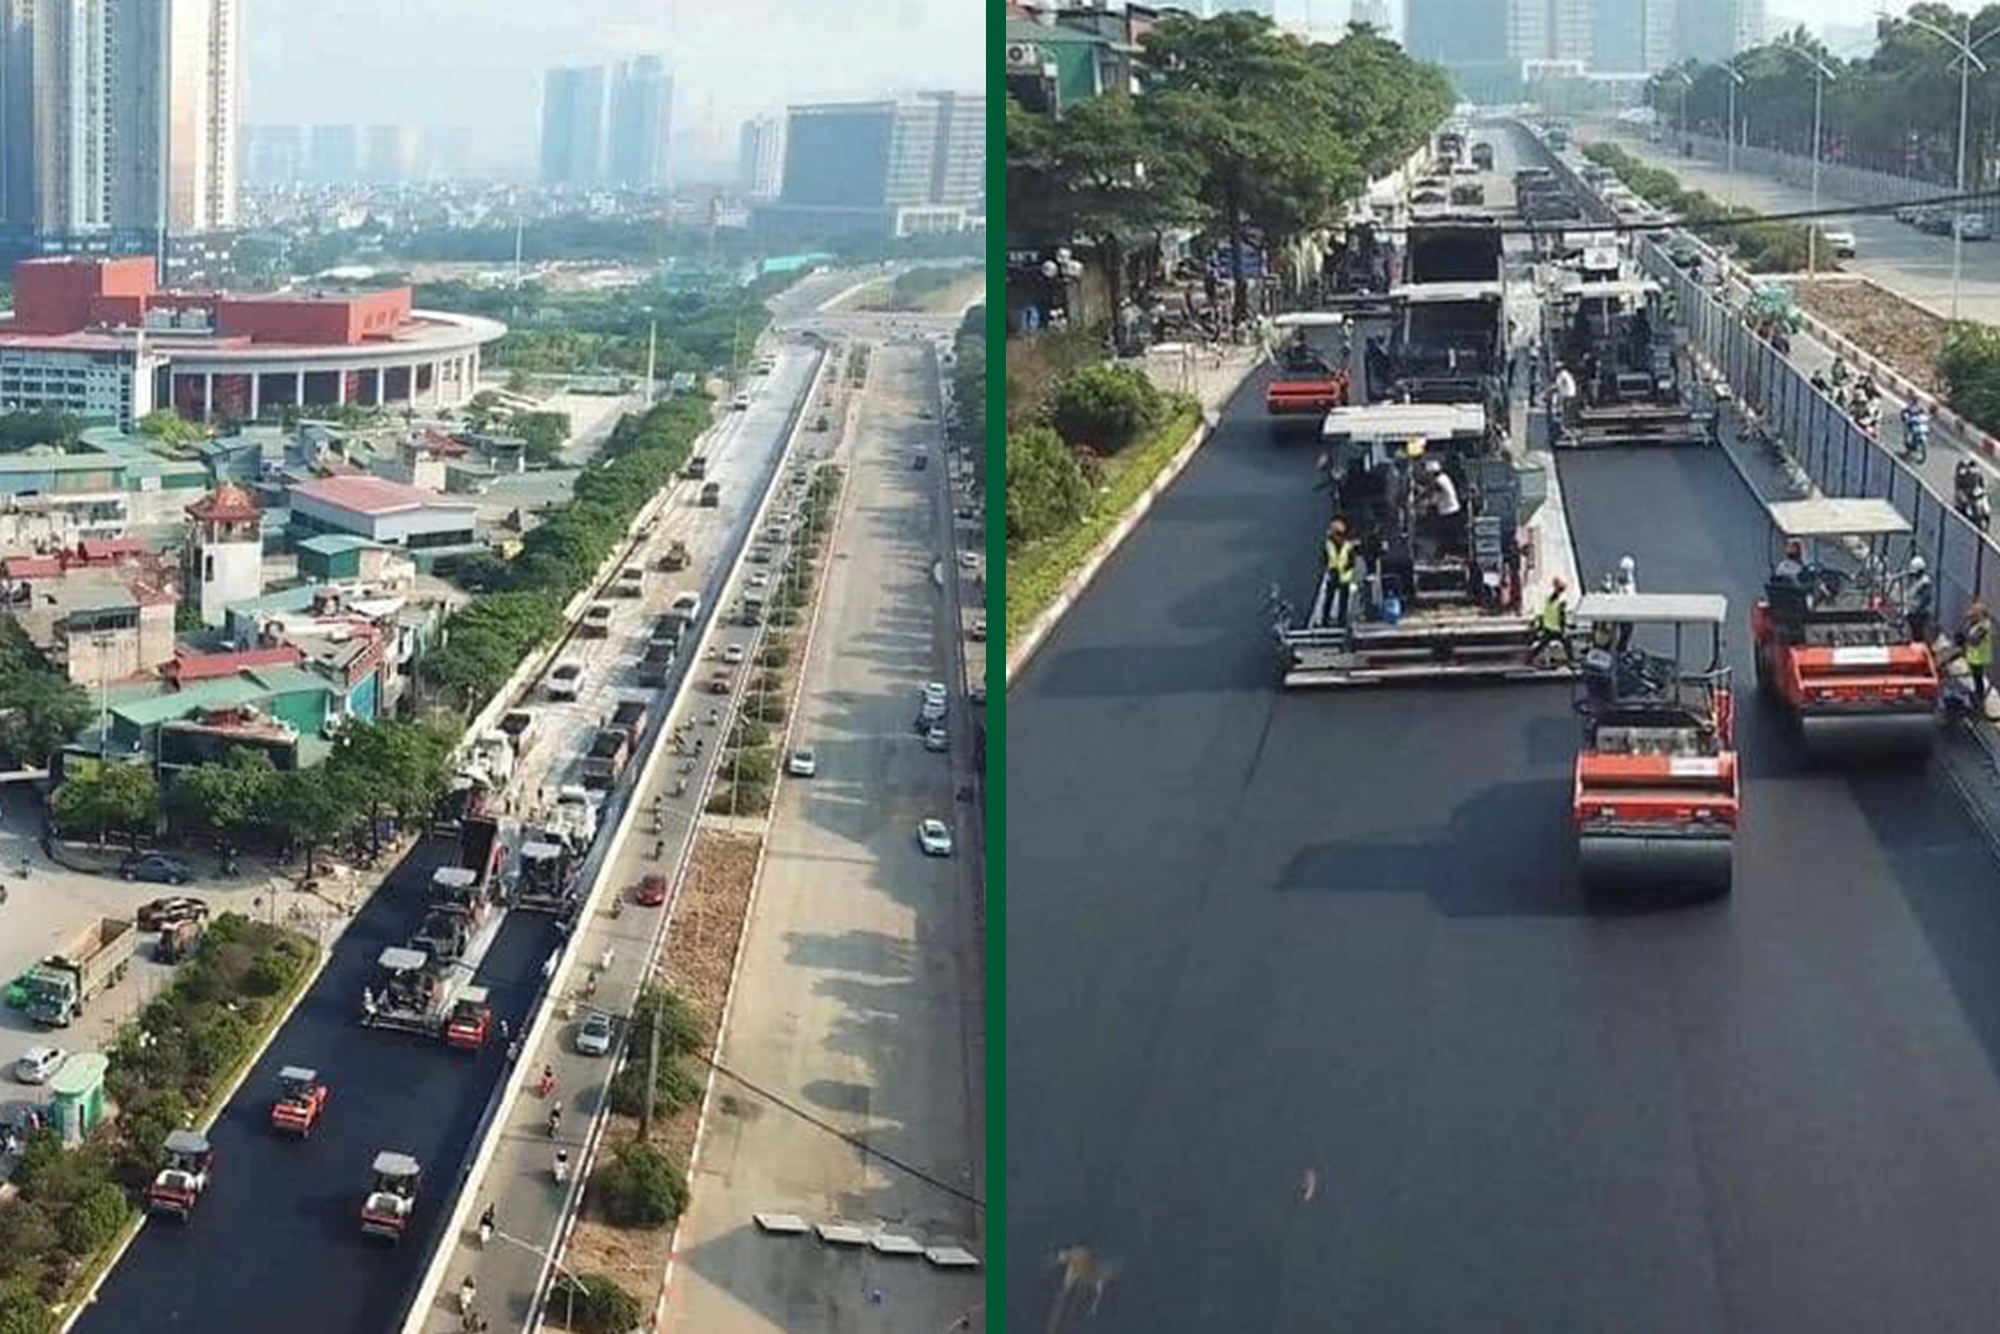 Hanoi street circuit surface being laid